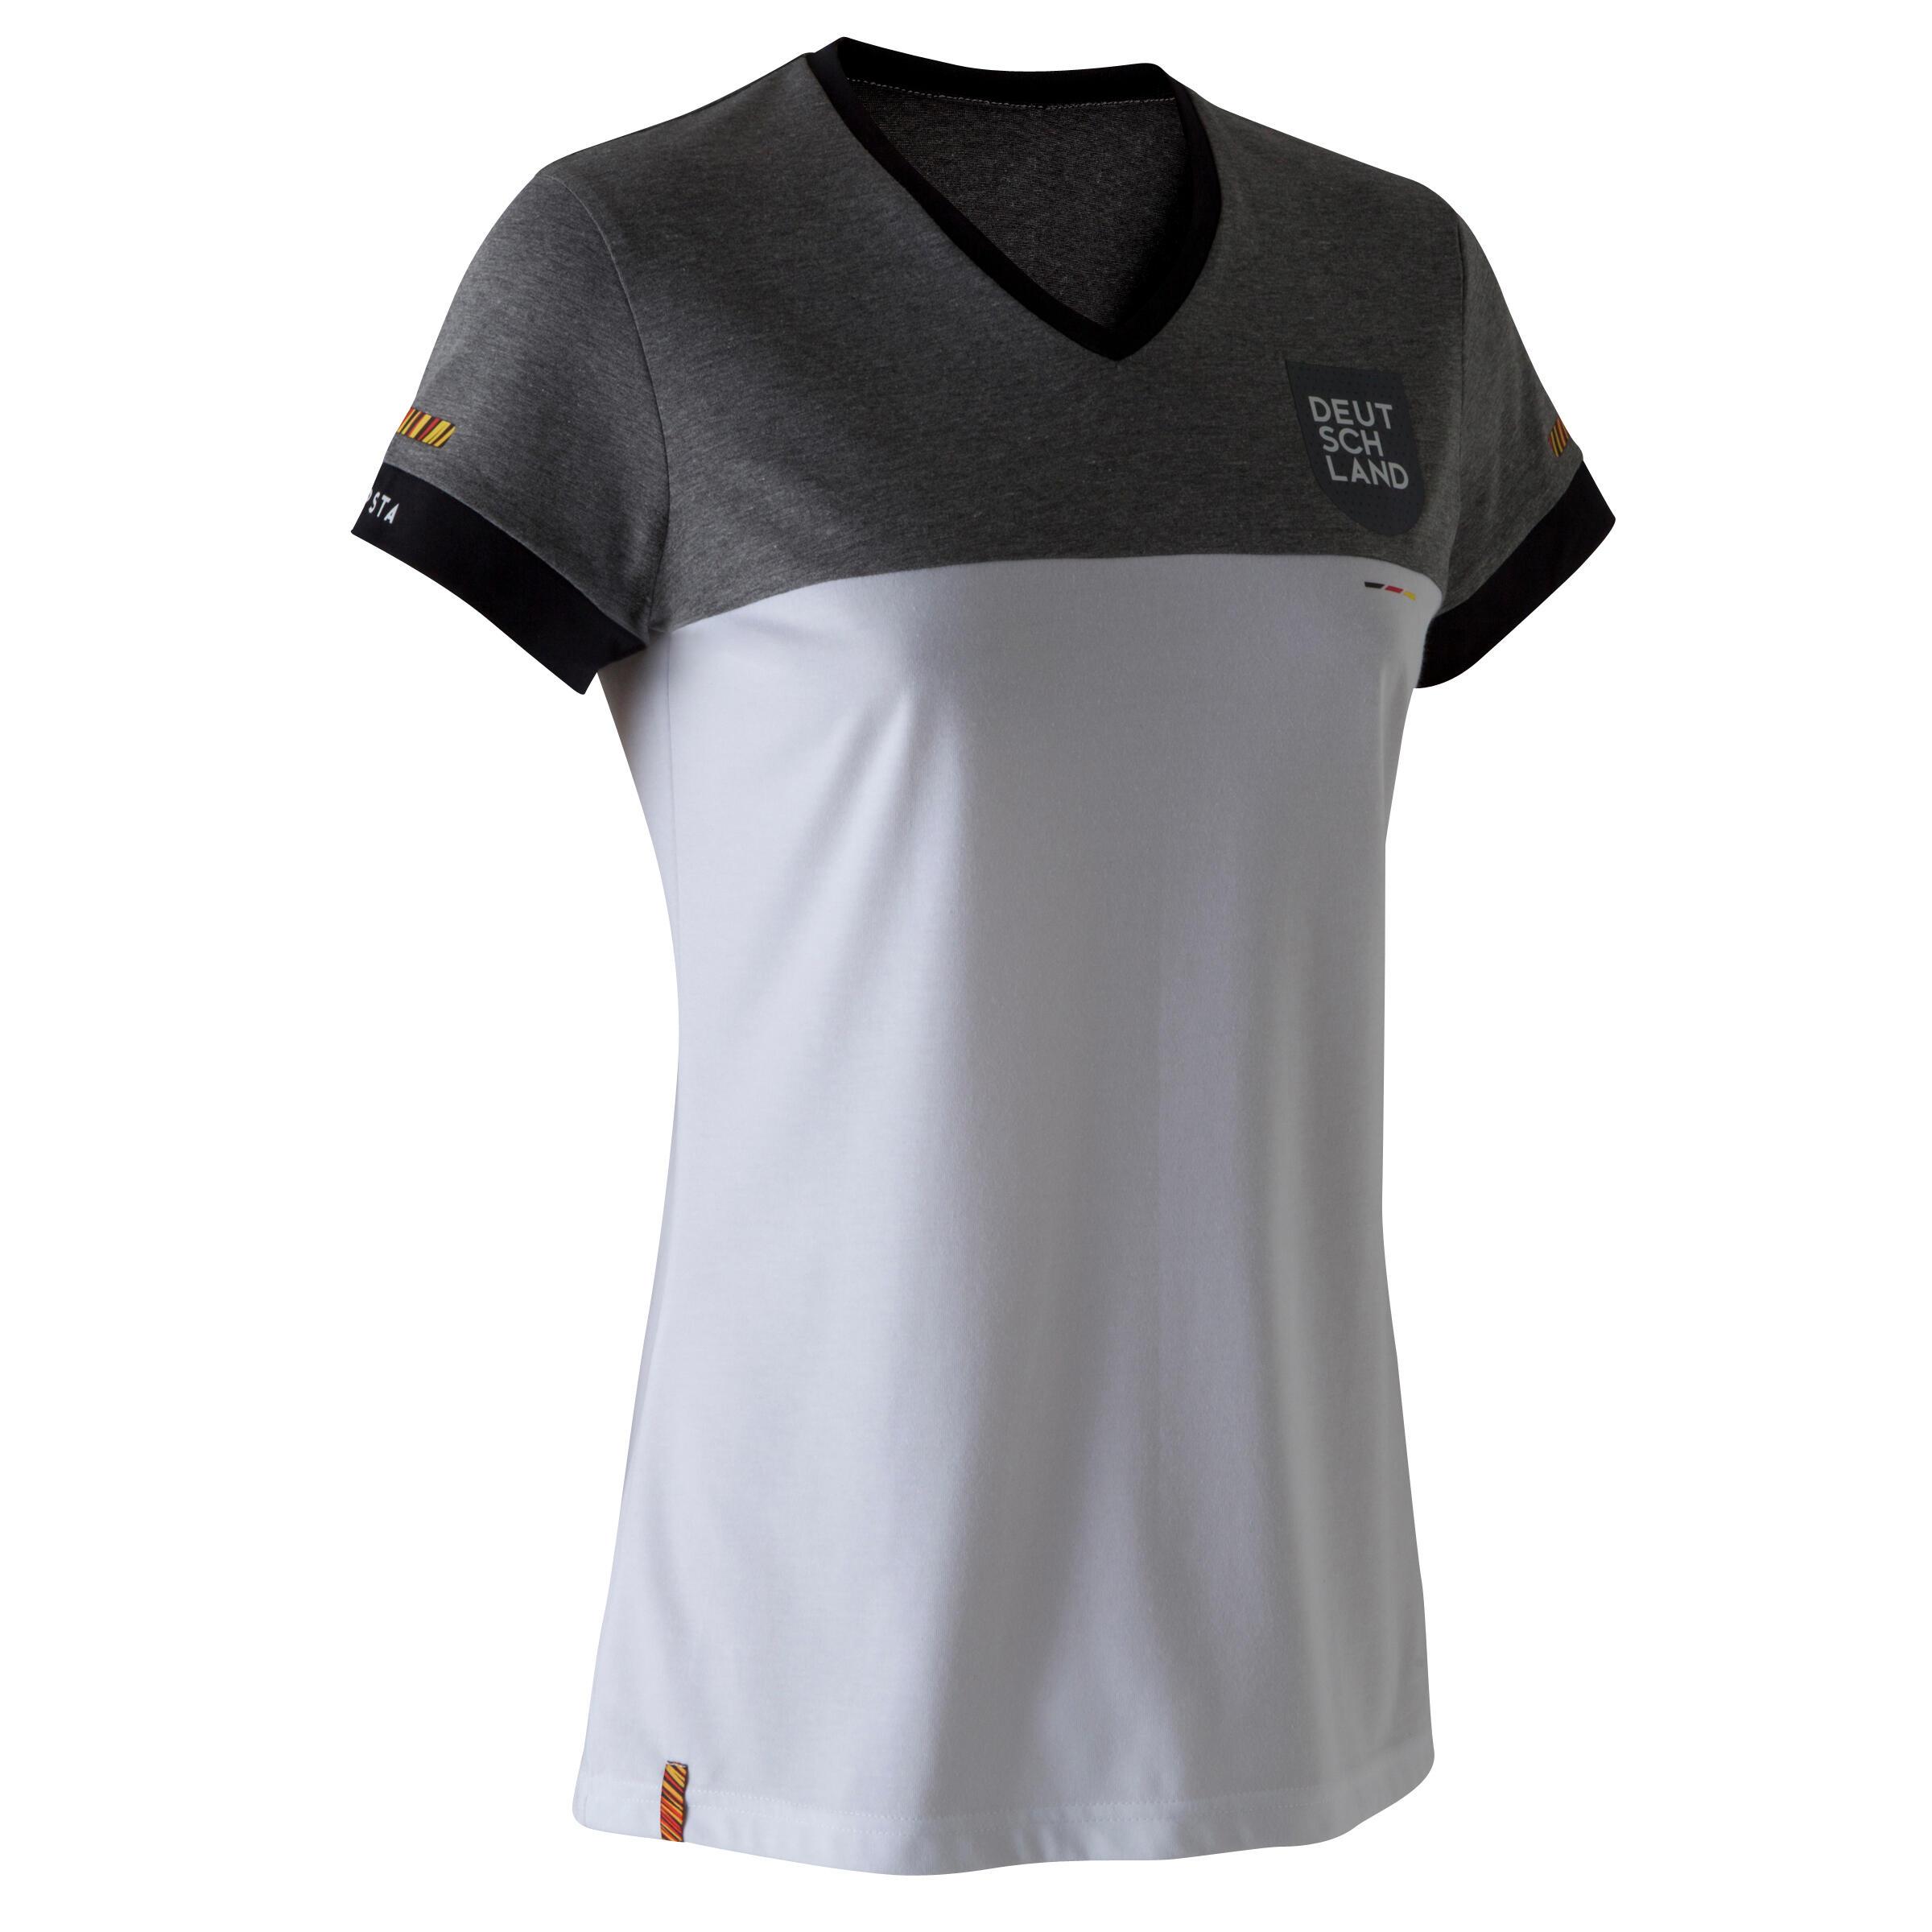 c8d6e0cbd Camisetas Oficiales Selecciones Fútbol 2018